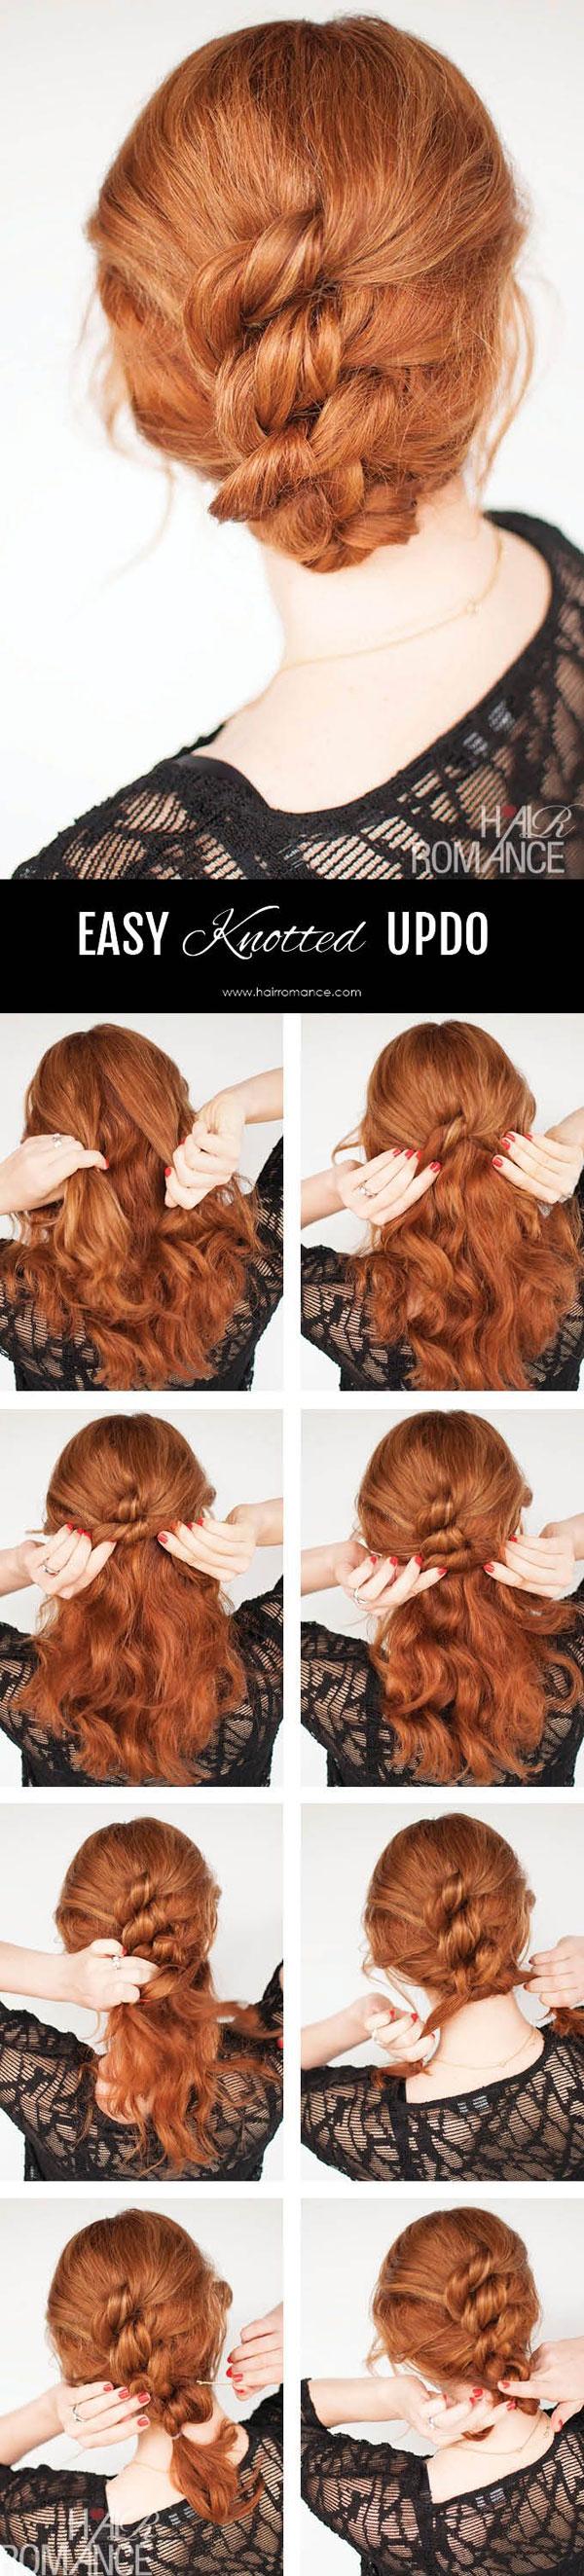 easy hairstyle tutorials for long hair longhair